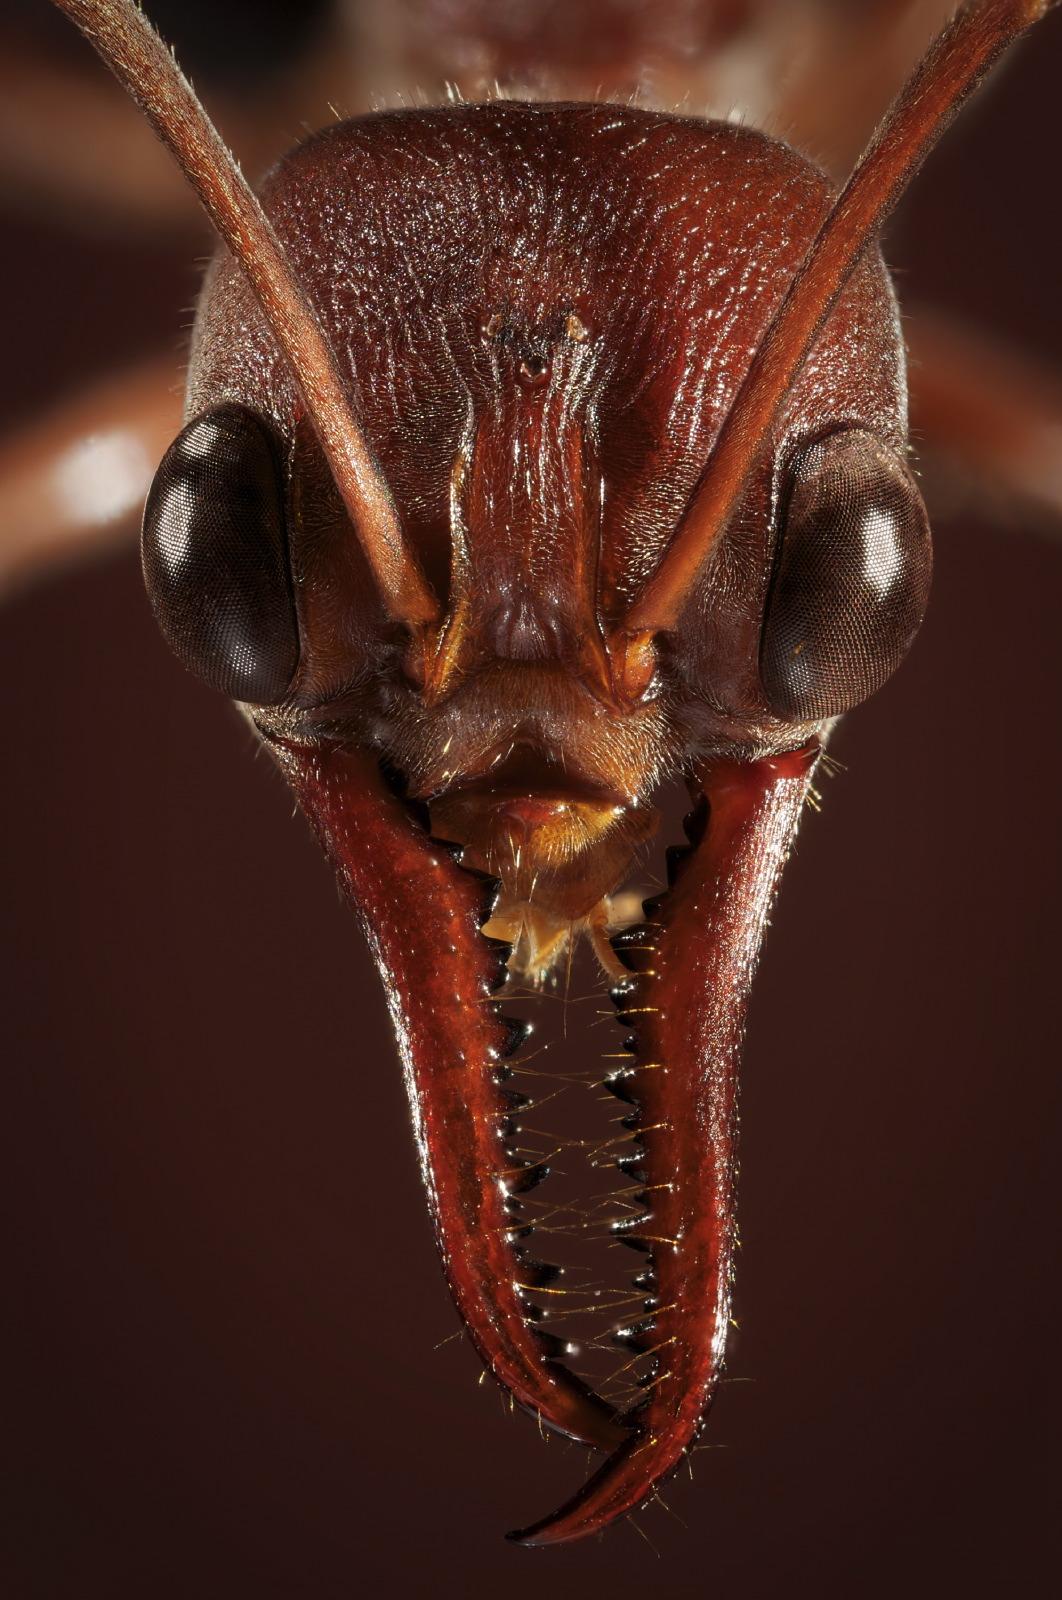 Myrmecia ant portrait close-up